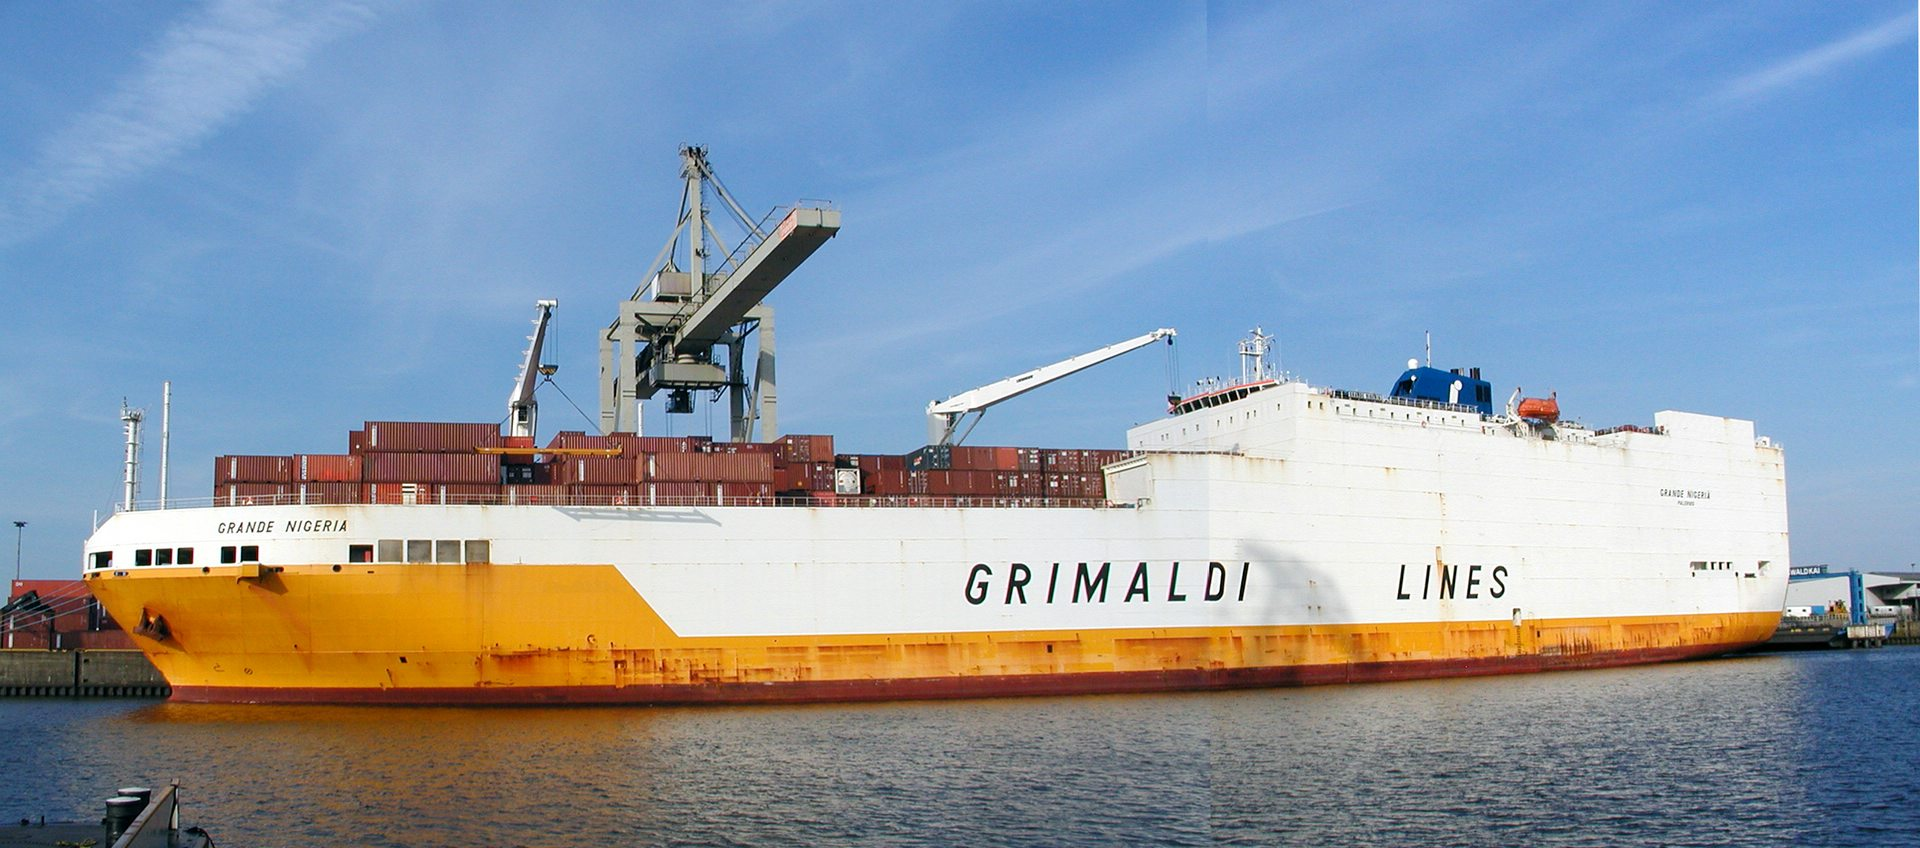 Grande Nigeria Grimaldi Lines